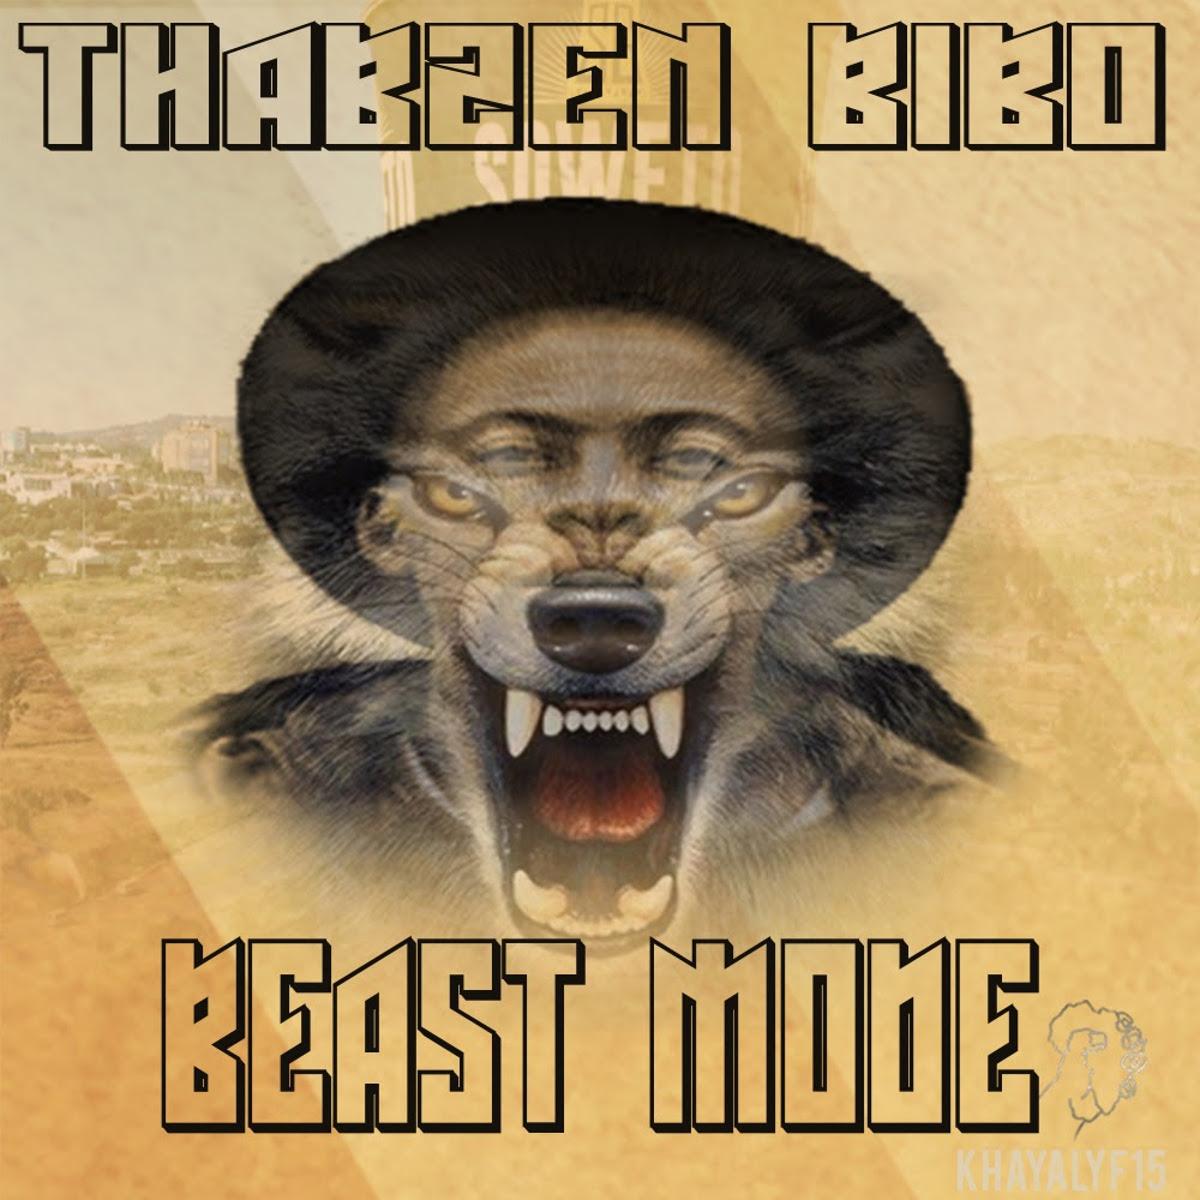 Thabzen Bibo Beast Mode - Thabzen Bibo – Beast Mode